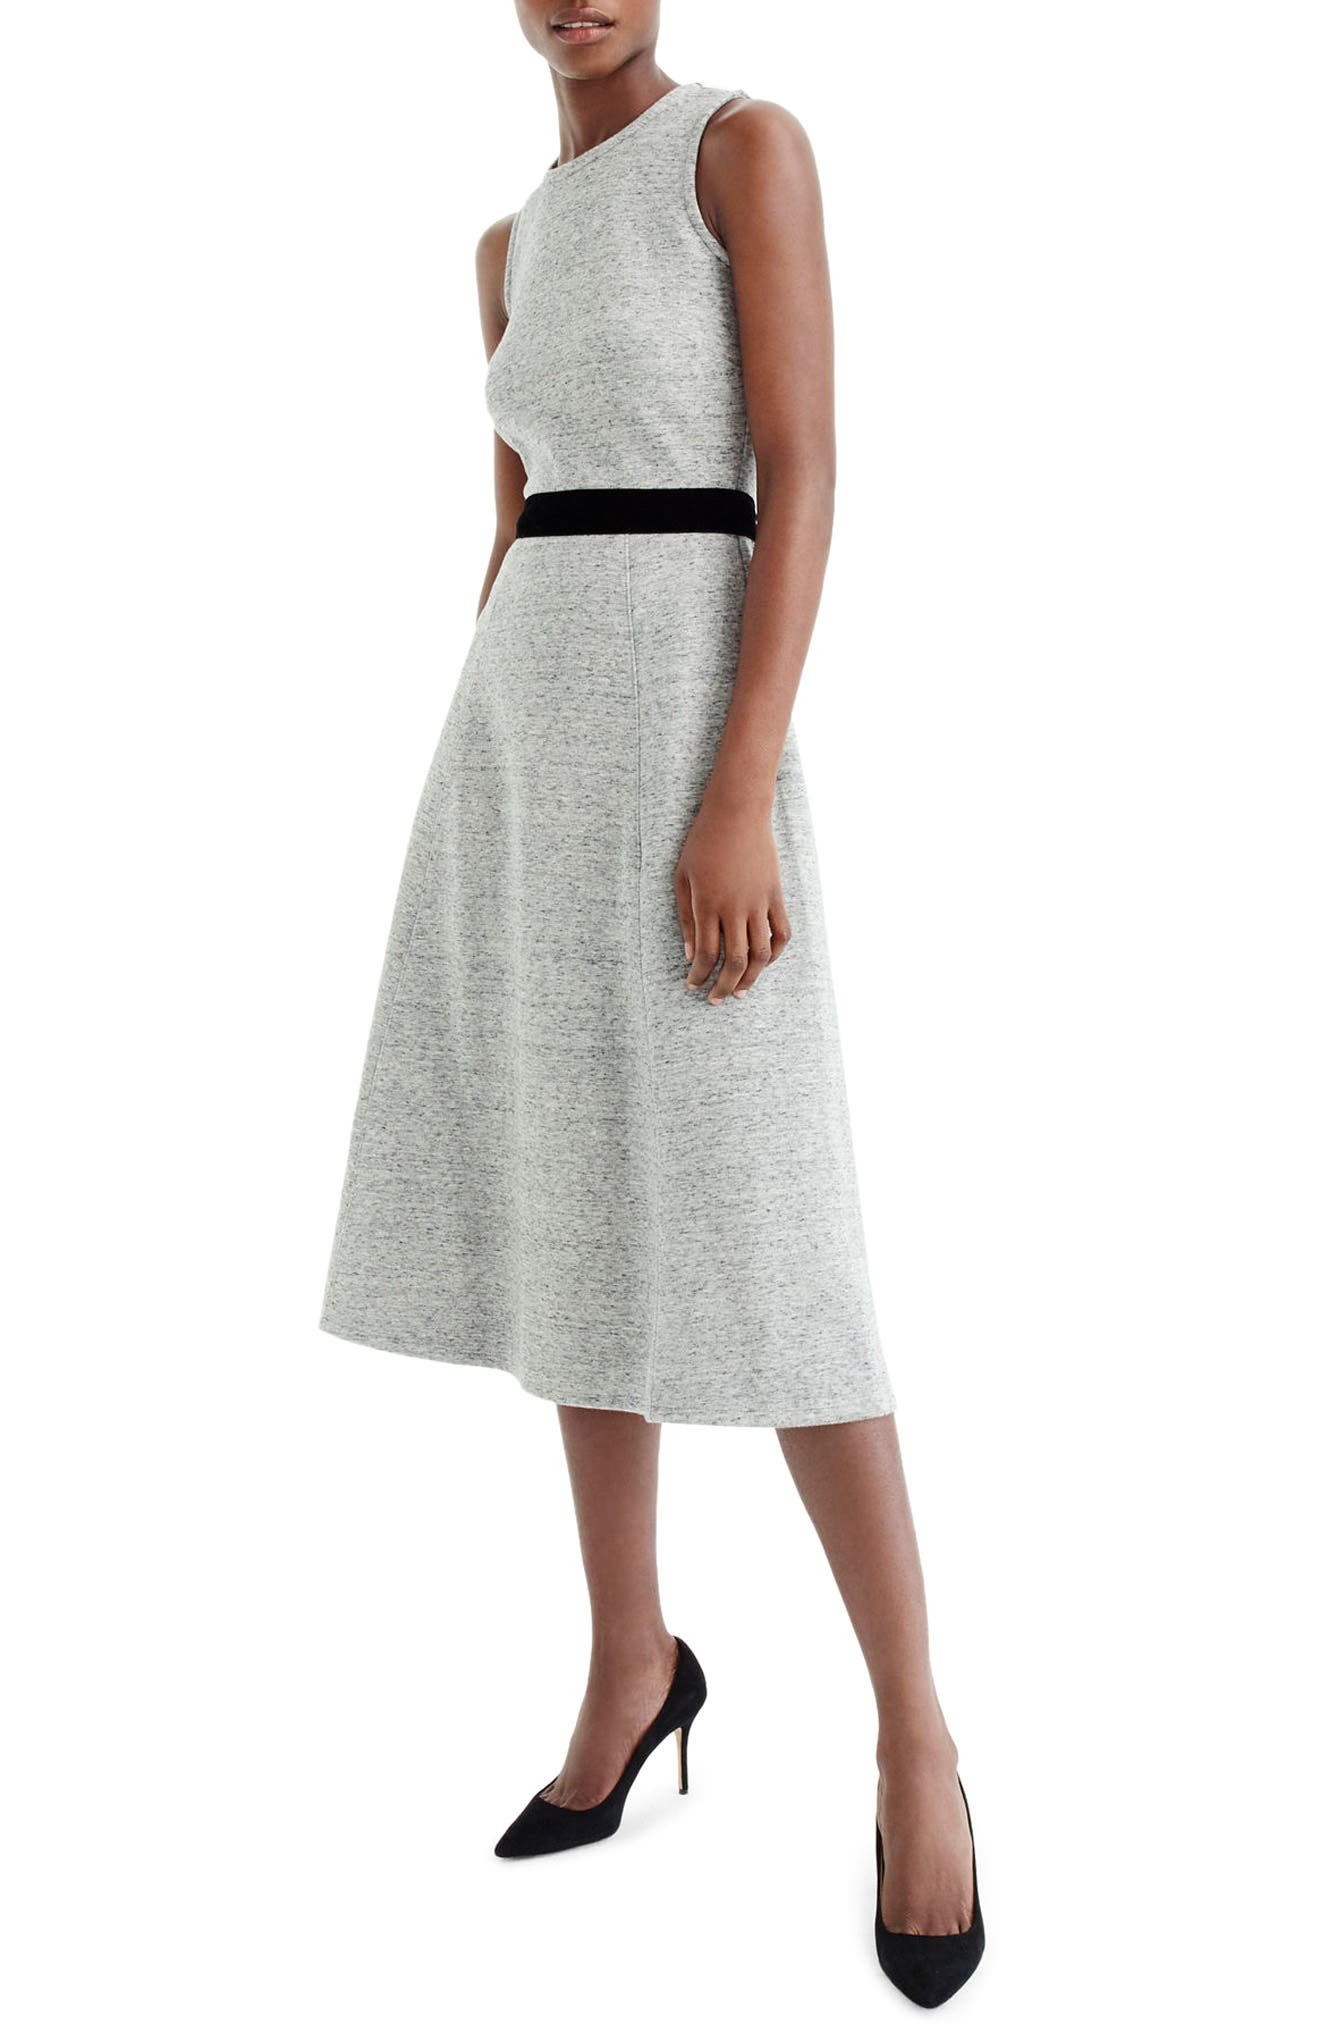 Velvet Tie A-Line Dress,                             Alternate thumbnail 6, color,                             020